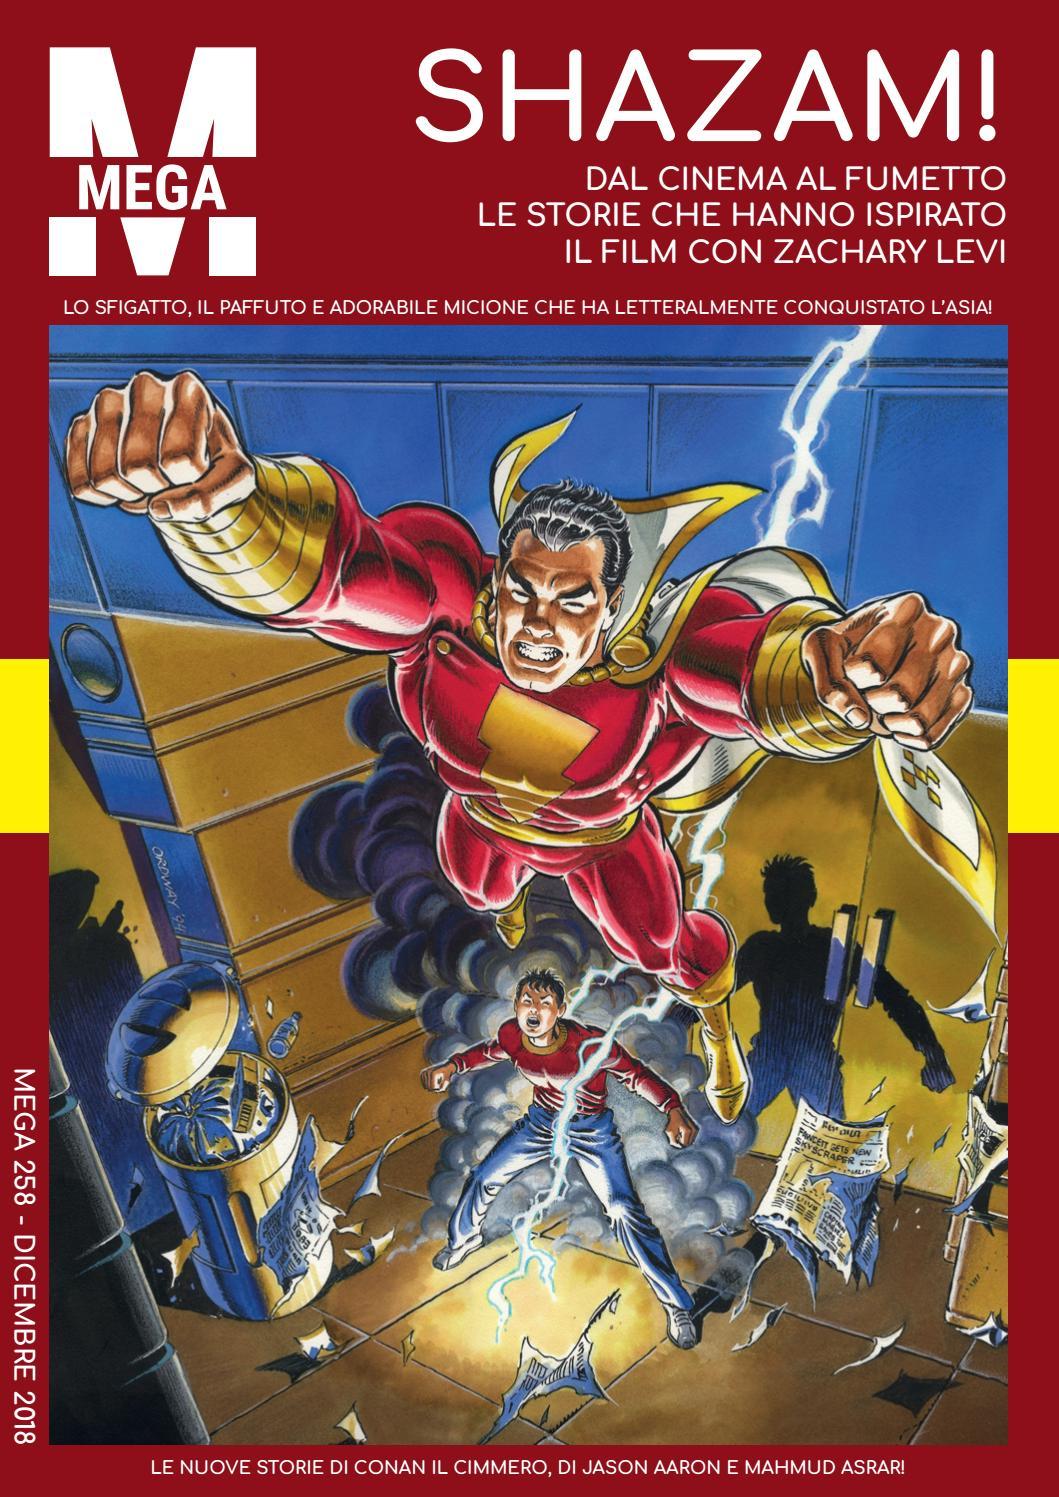 Spider-Man Steel Avenger alleanza 3 guerra infinita Action Figure giocattoli IT